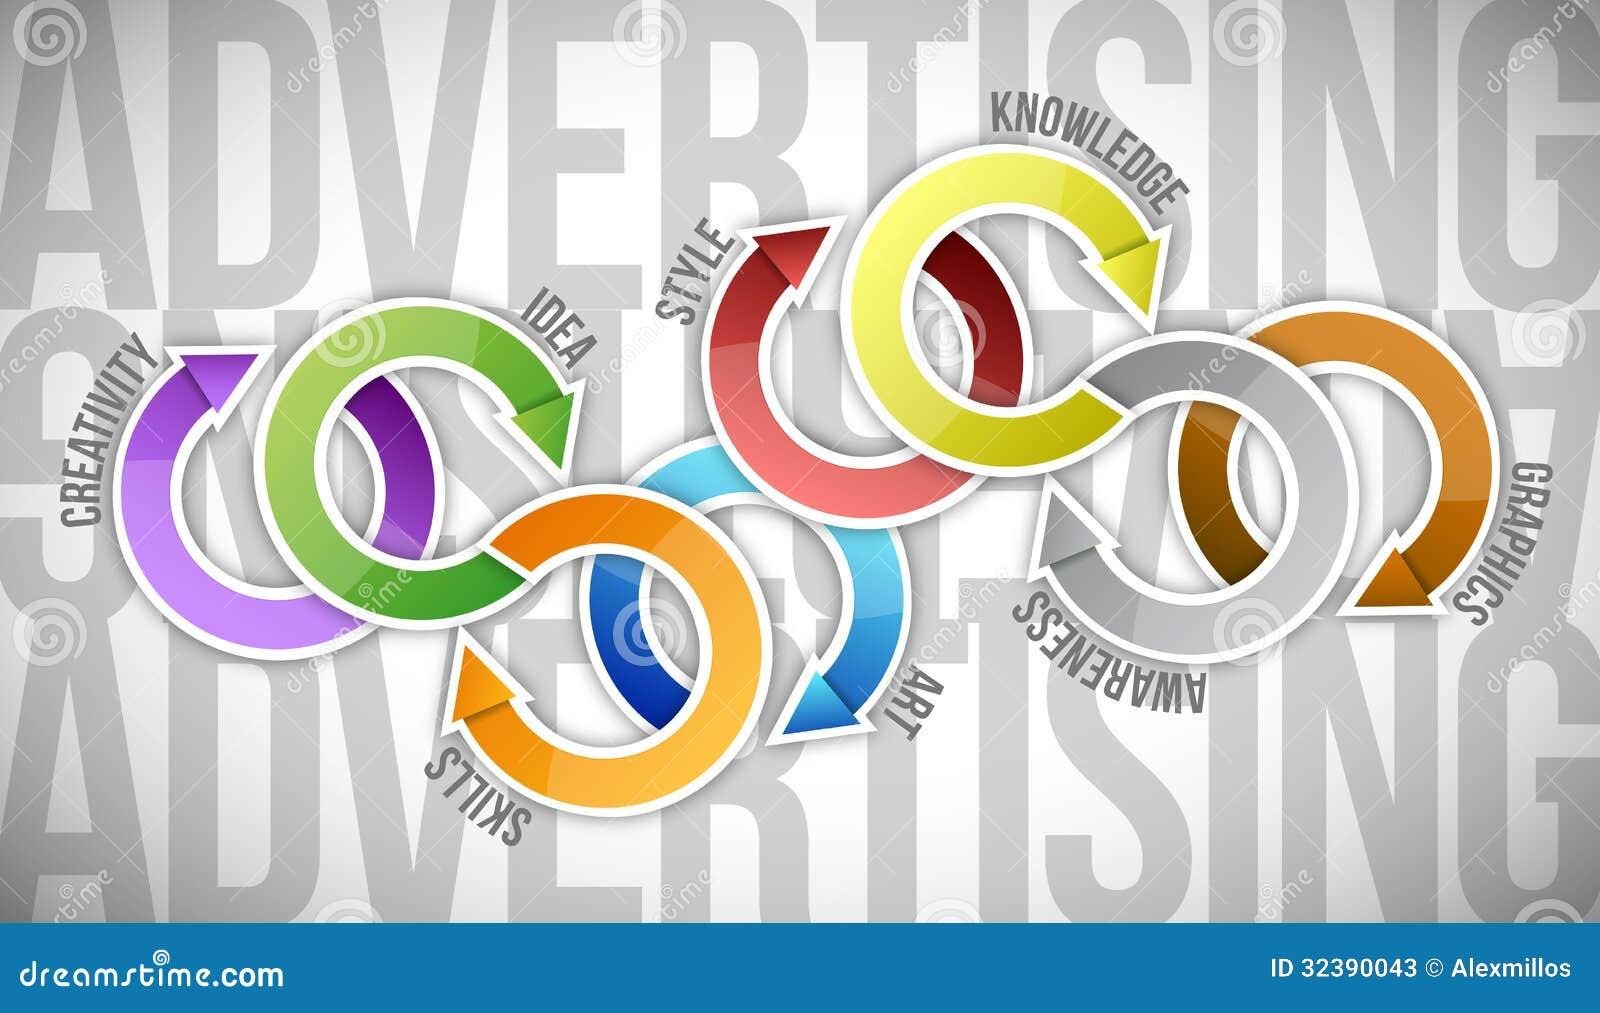 The cyclical politics of graphic design